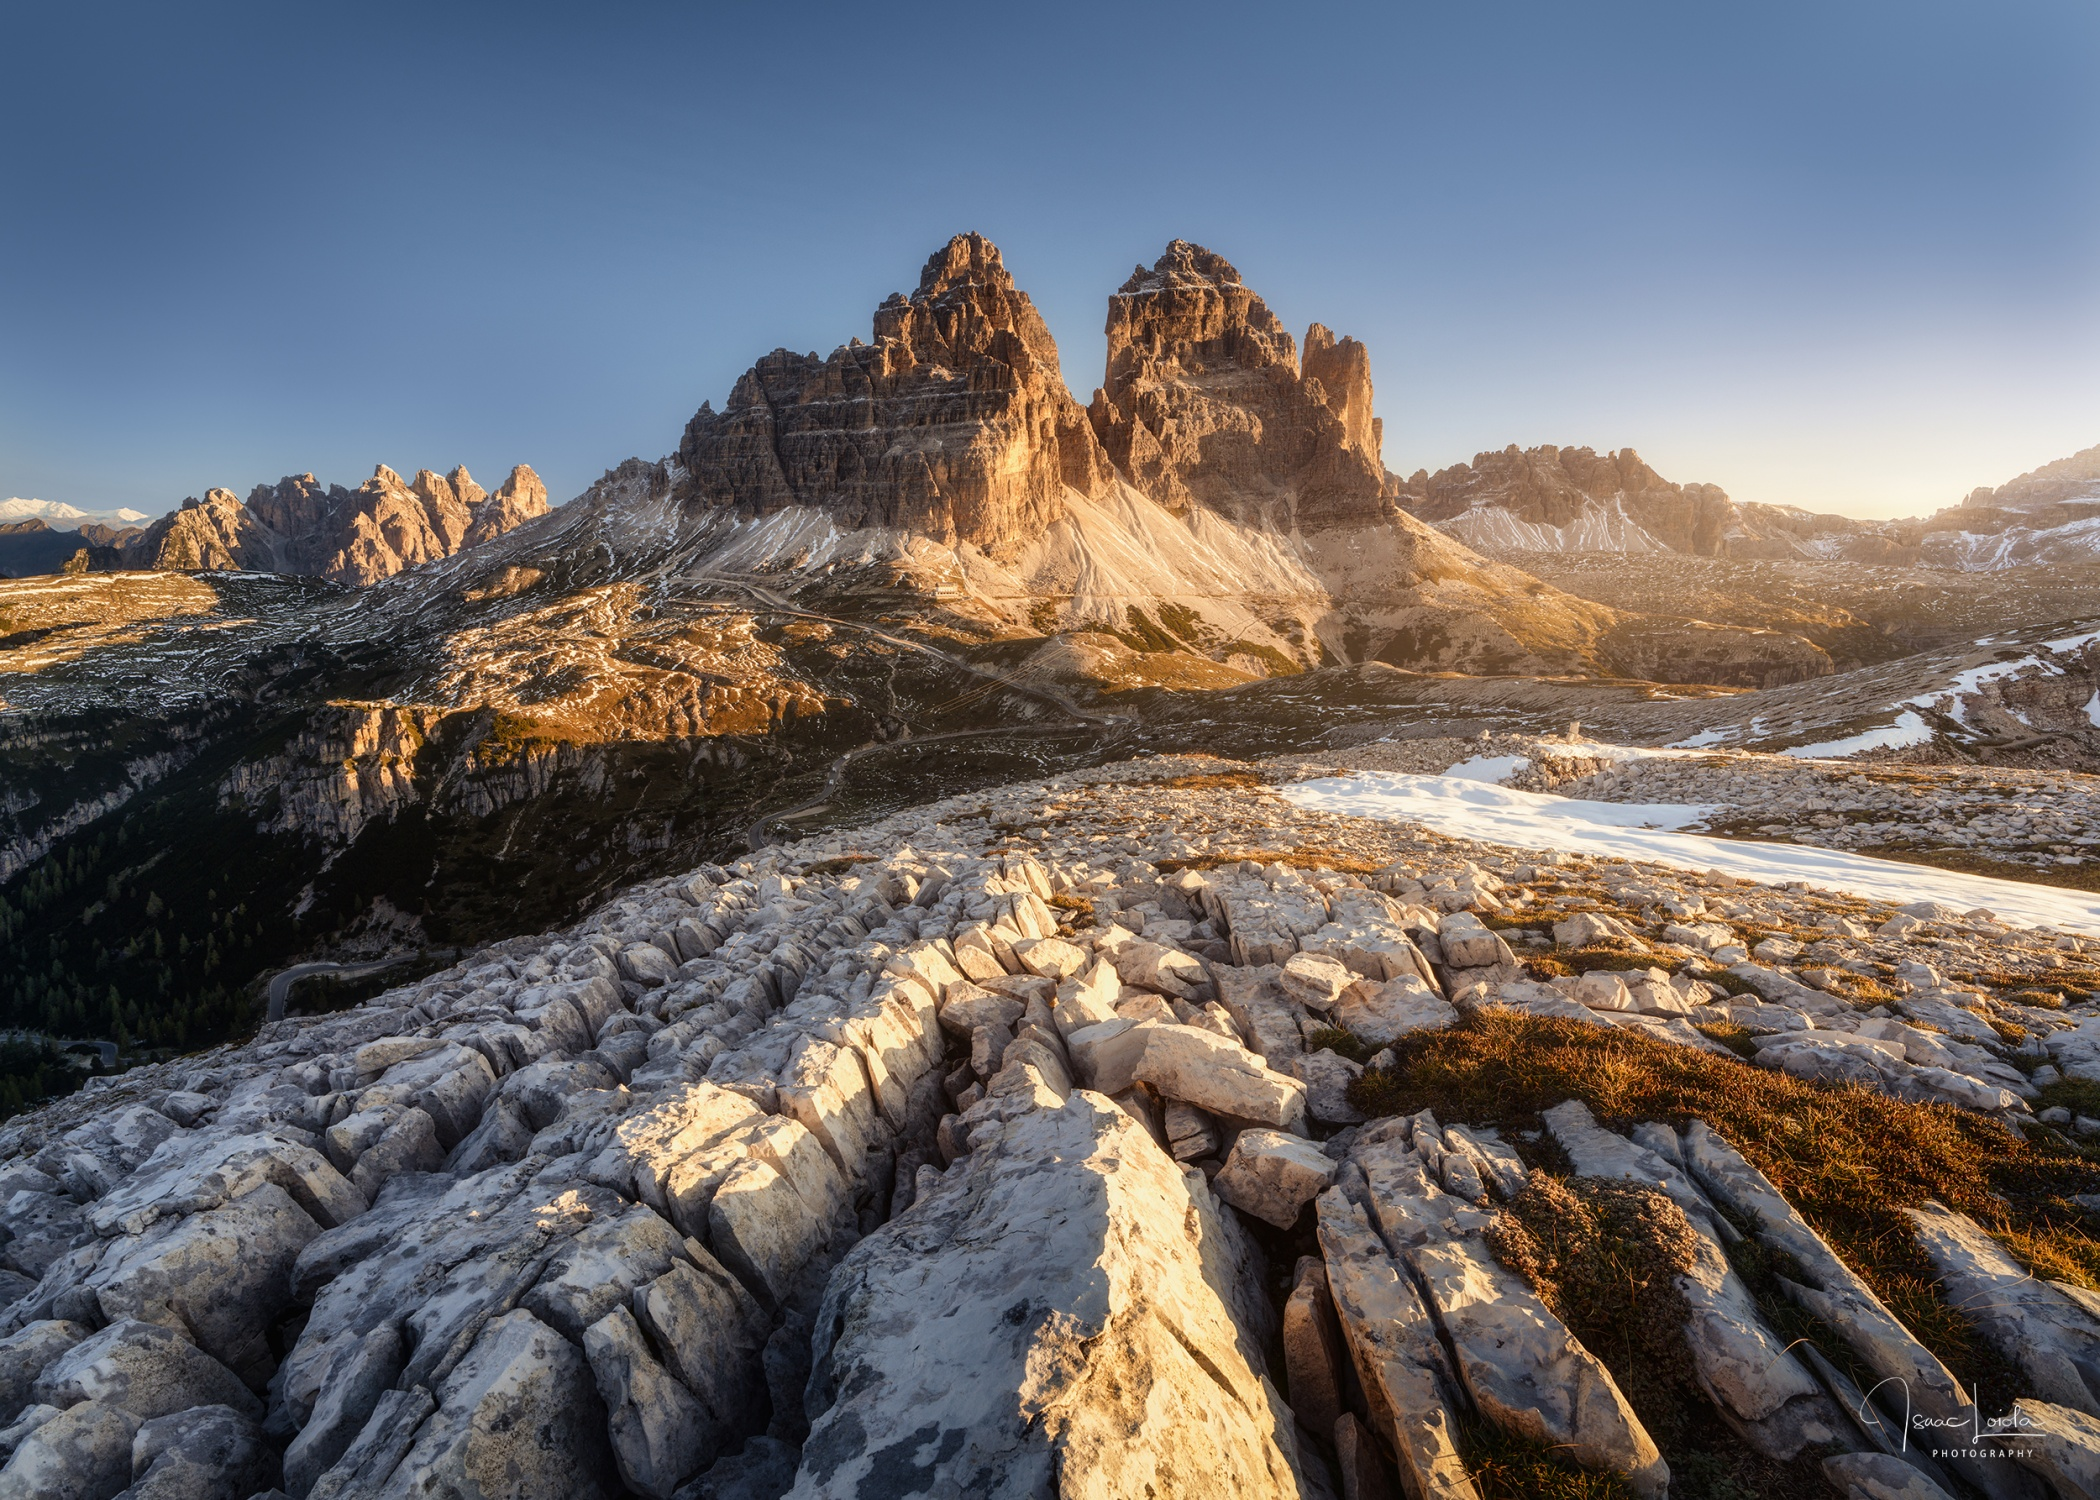 Tre Cime - Mountain lights - Isaac Loiola, Photography